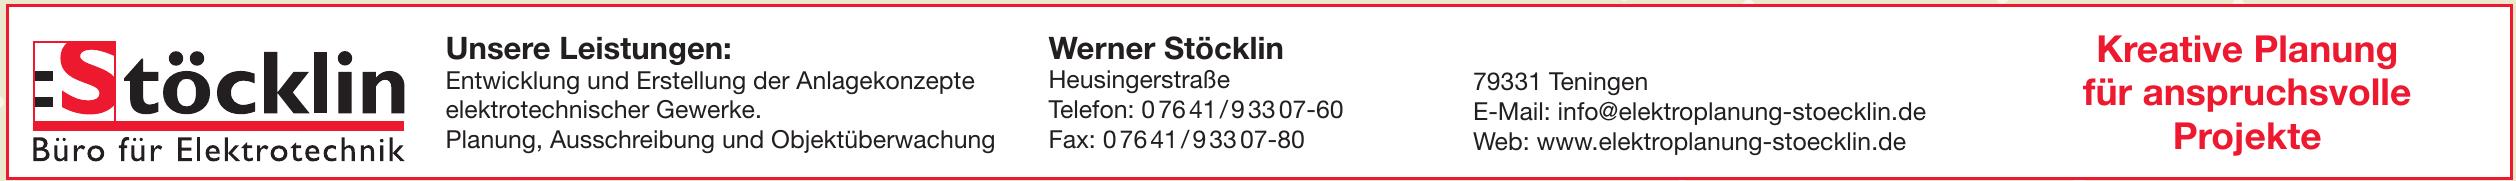 Stöcklin Büro für Elektrotechnik